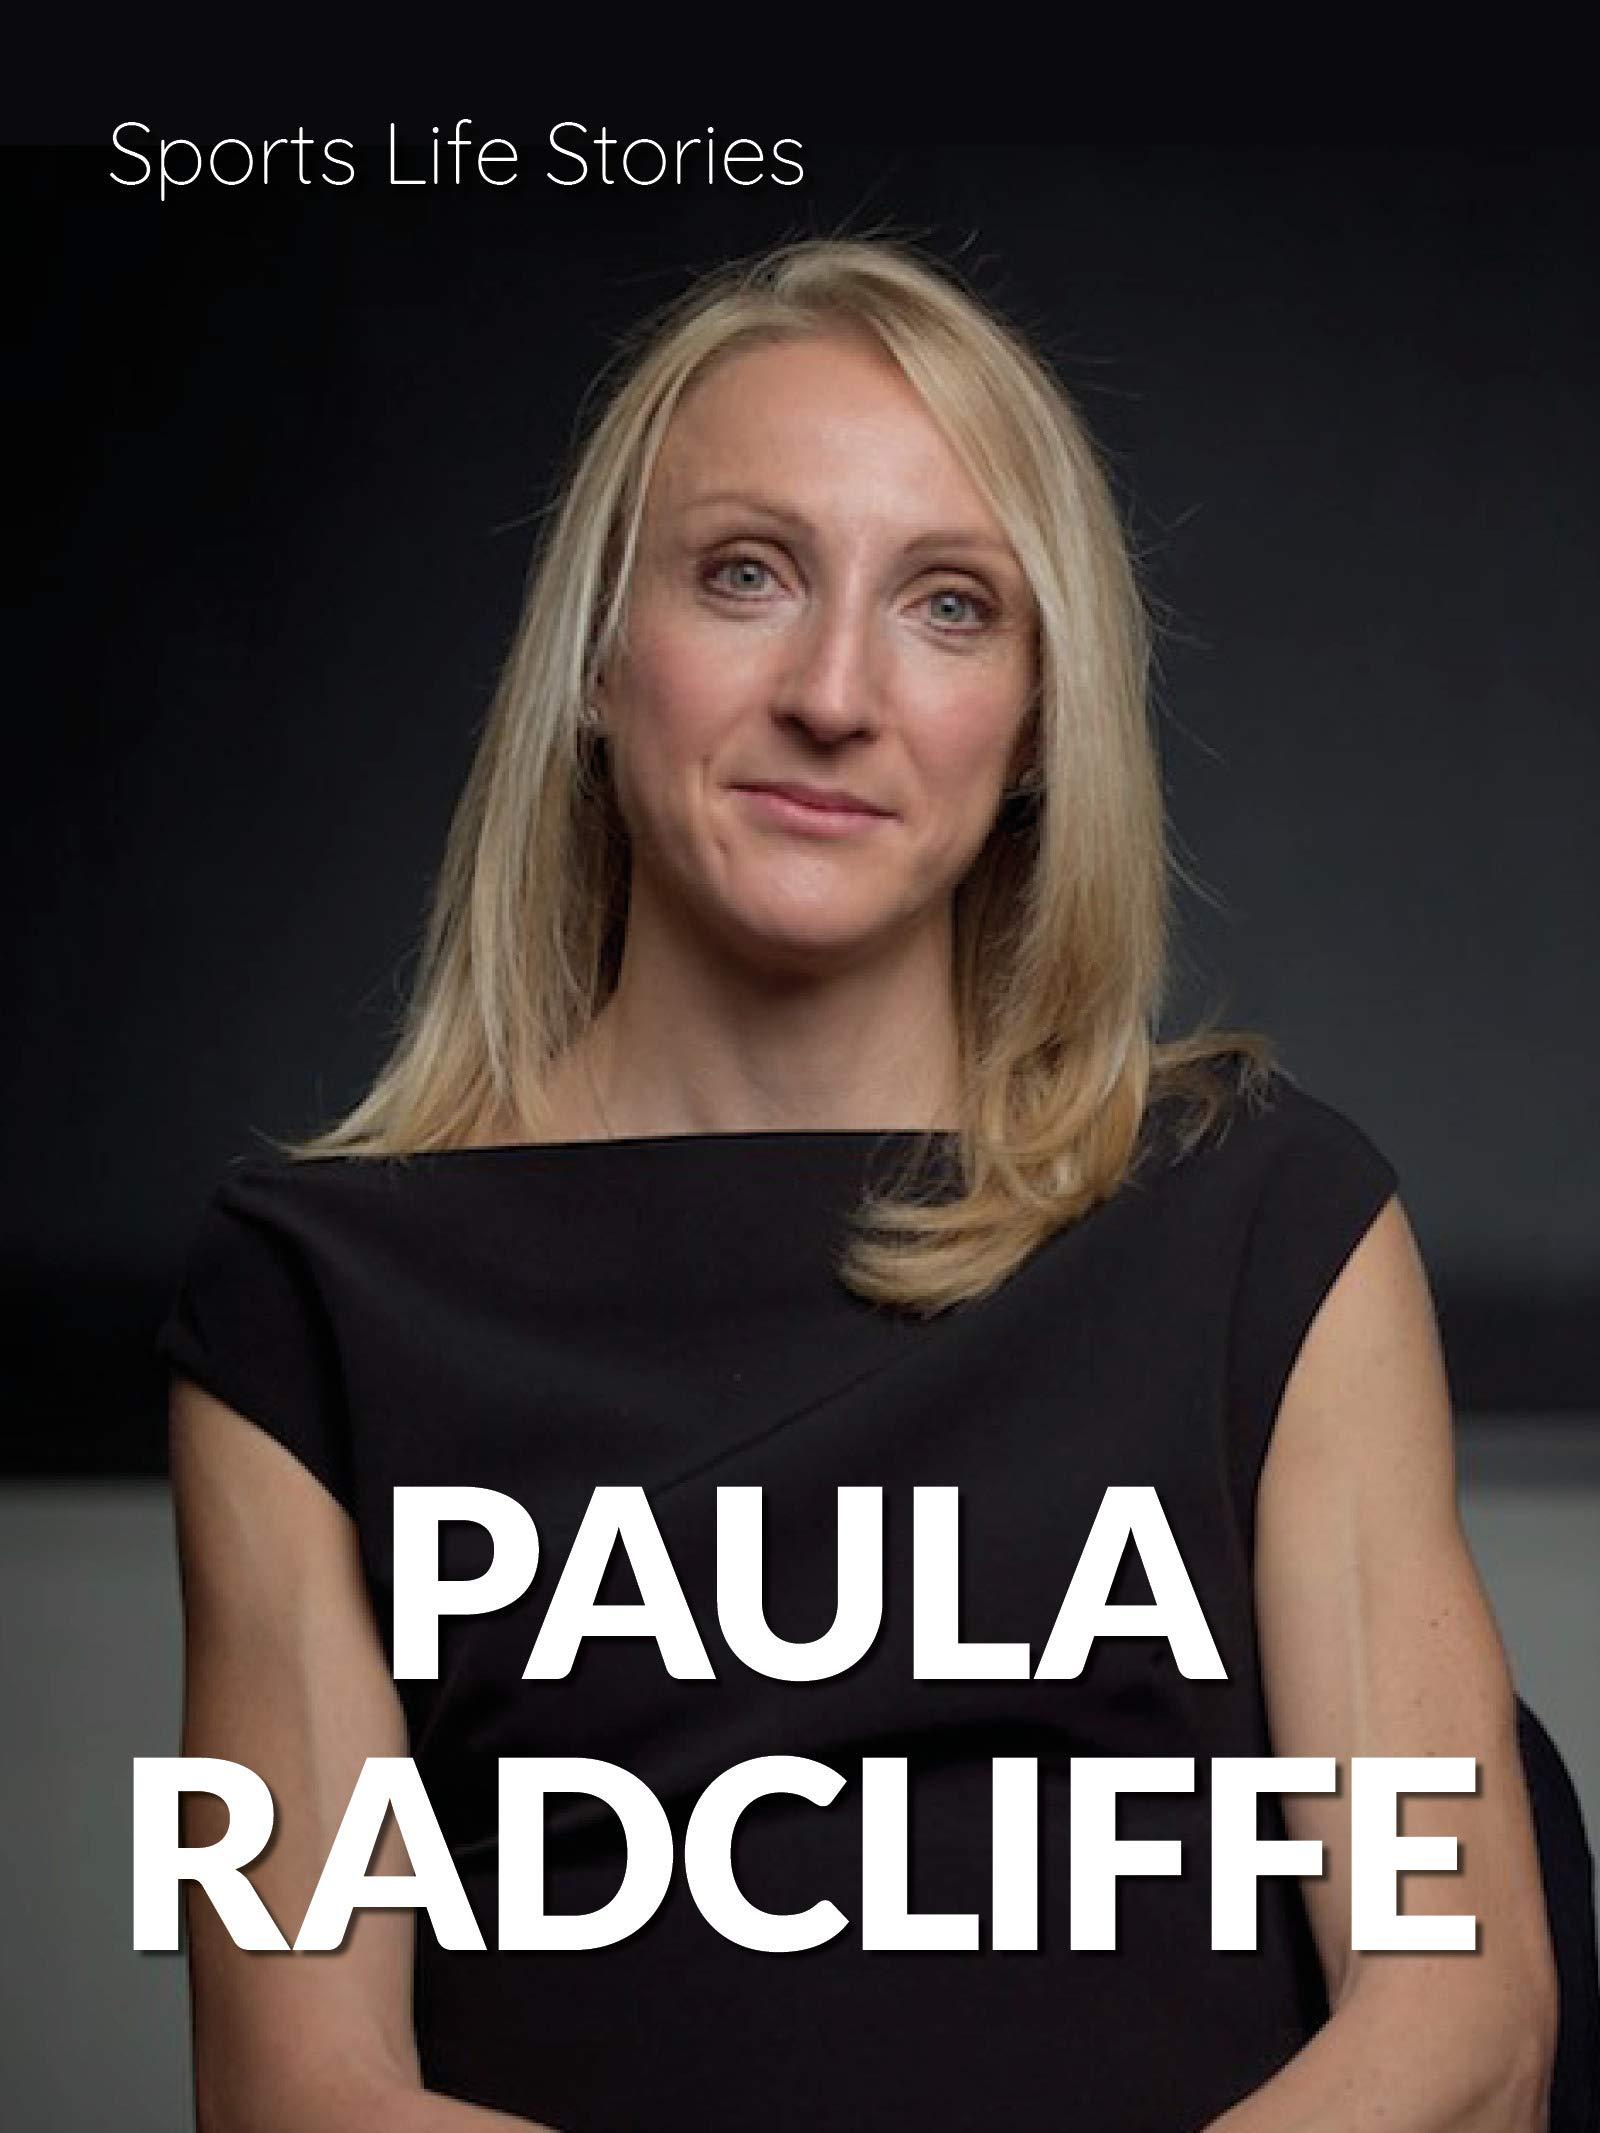 Sports Life Stories - Paula Radcliffe on Amazon Prime Instant Video UK